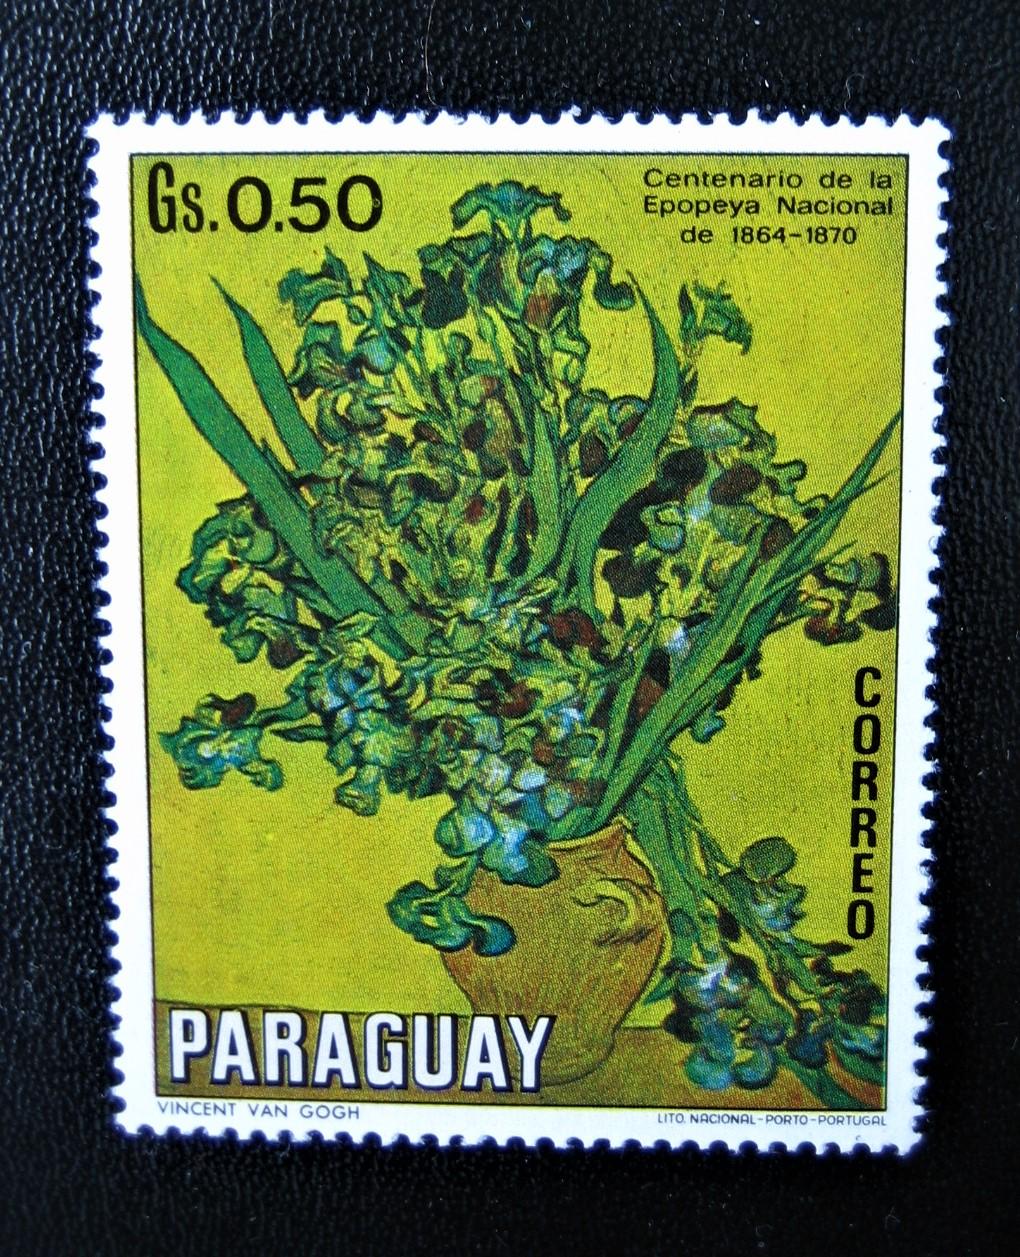 "Марка Парагвай выпущена в  1970-11-26 из серии ""Картины цветов"" номер по каталогу Mi:PY 2097, Sn:PY 1300, Yt:PY, на марке картина Винсента Ван Гога ""Ирисы"", номинал — 0,50 Gs"